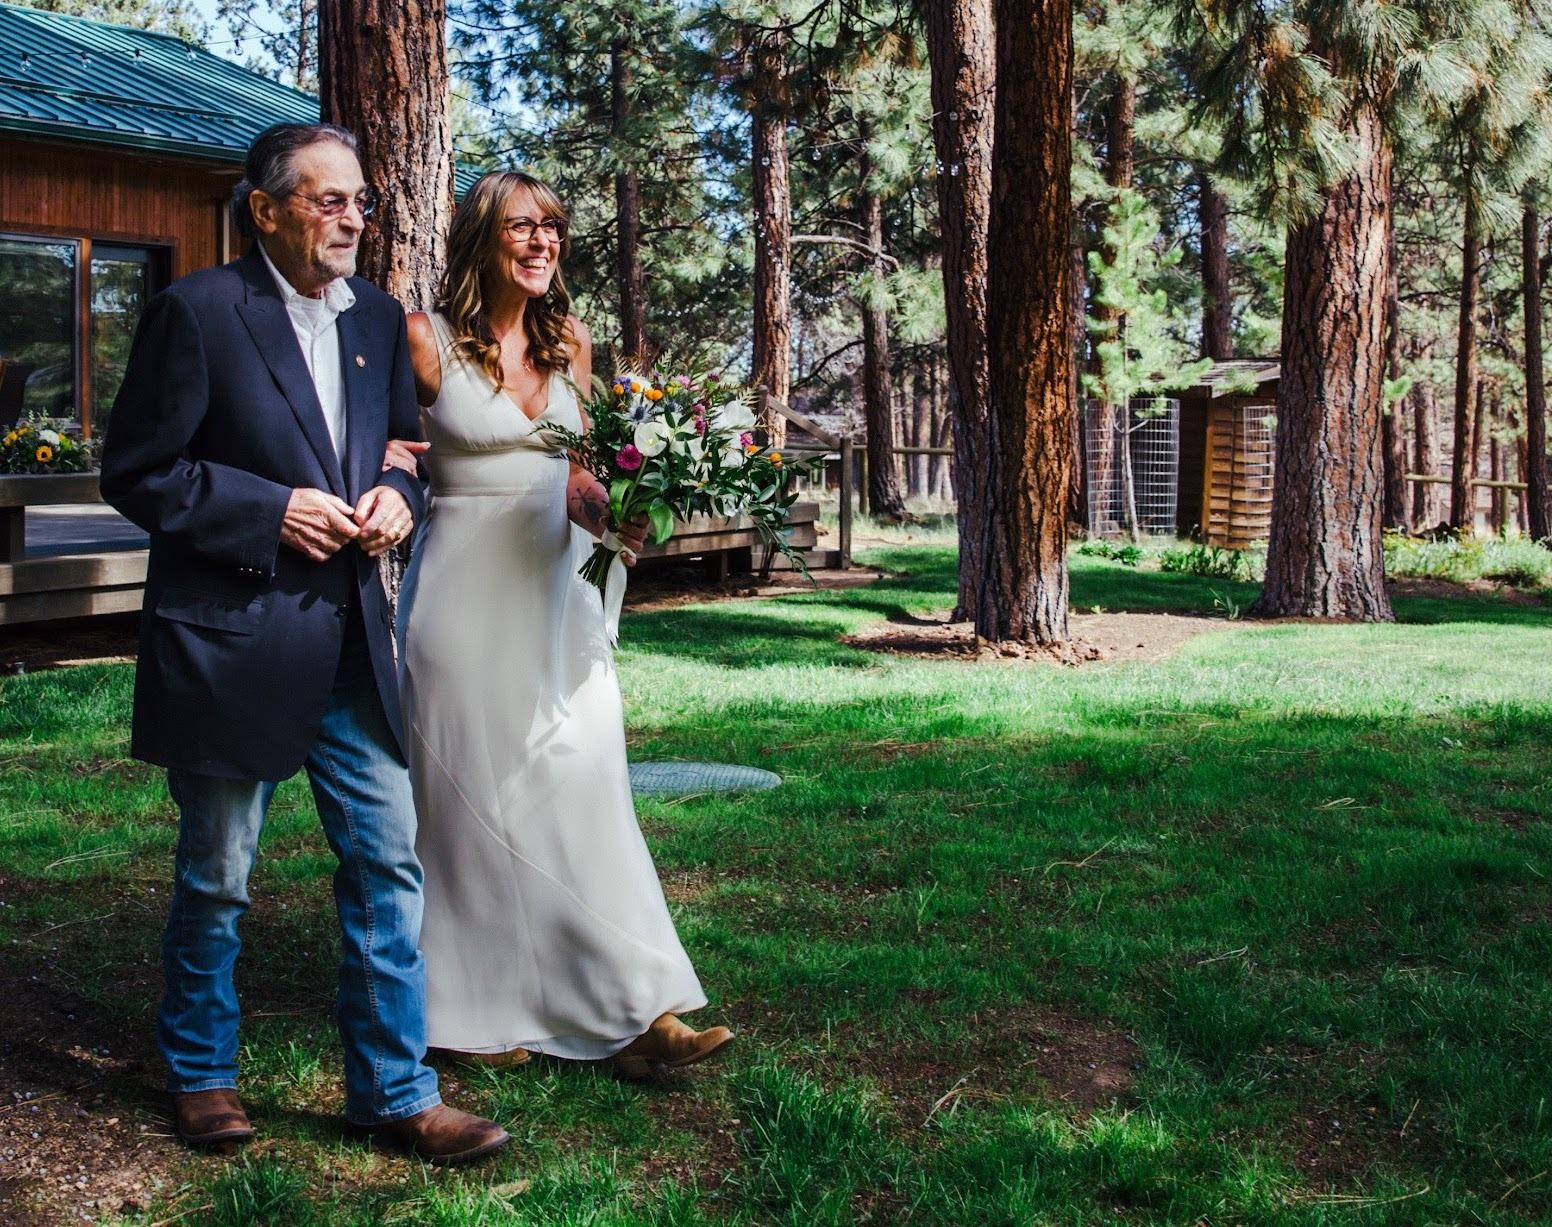 john james and daughter allison james-henry at her wedding sisters oregon